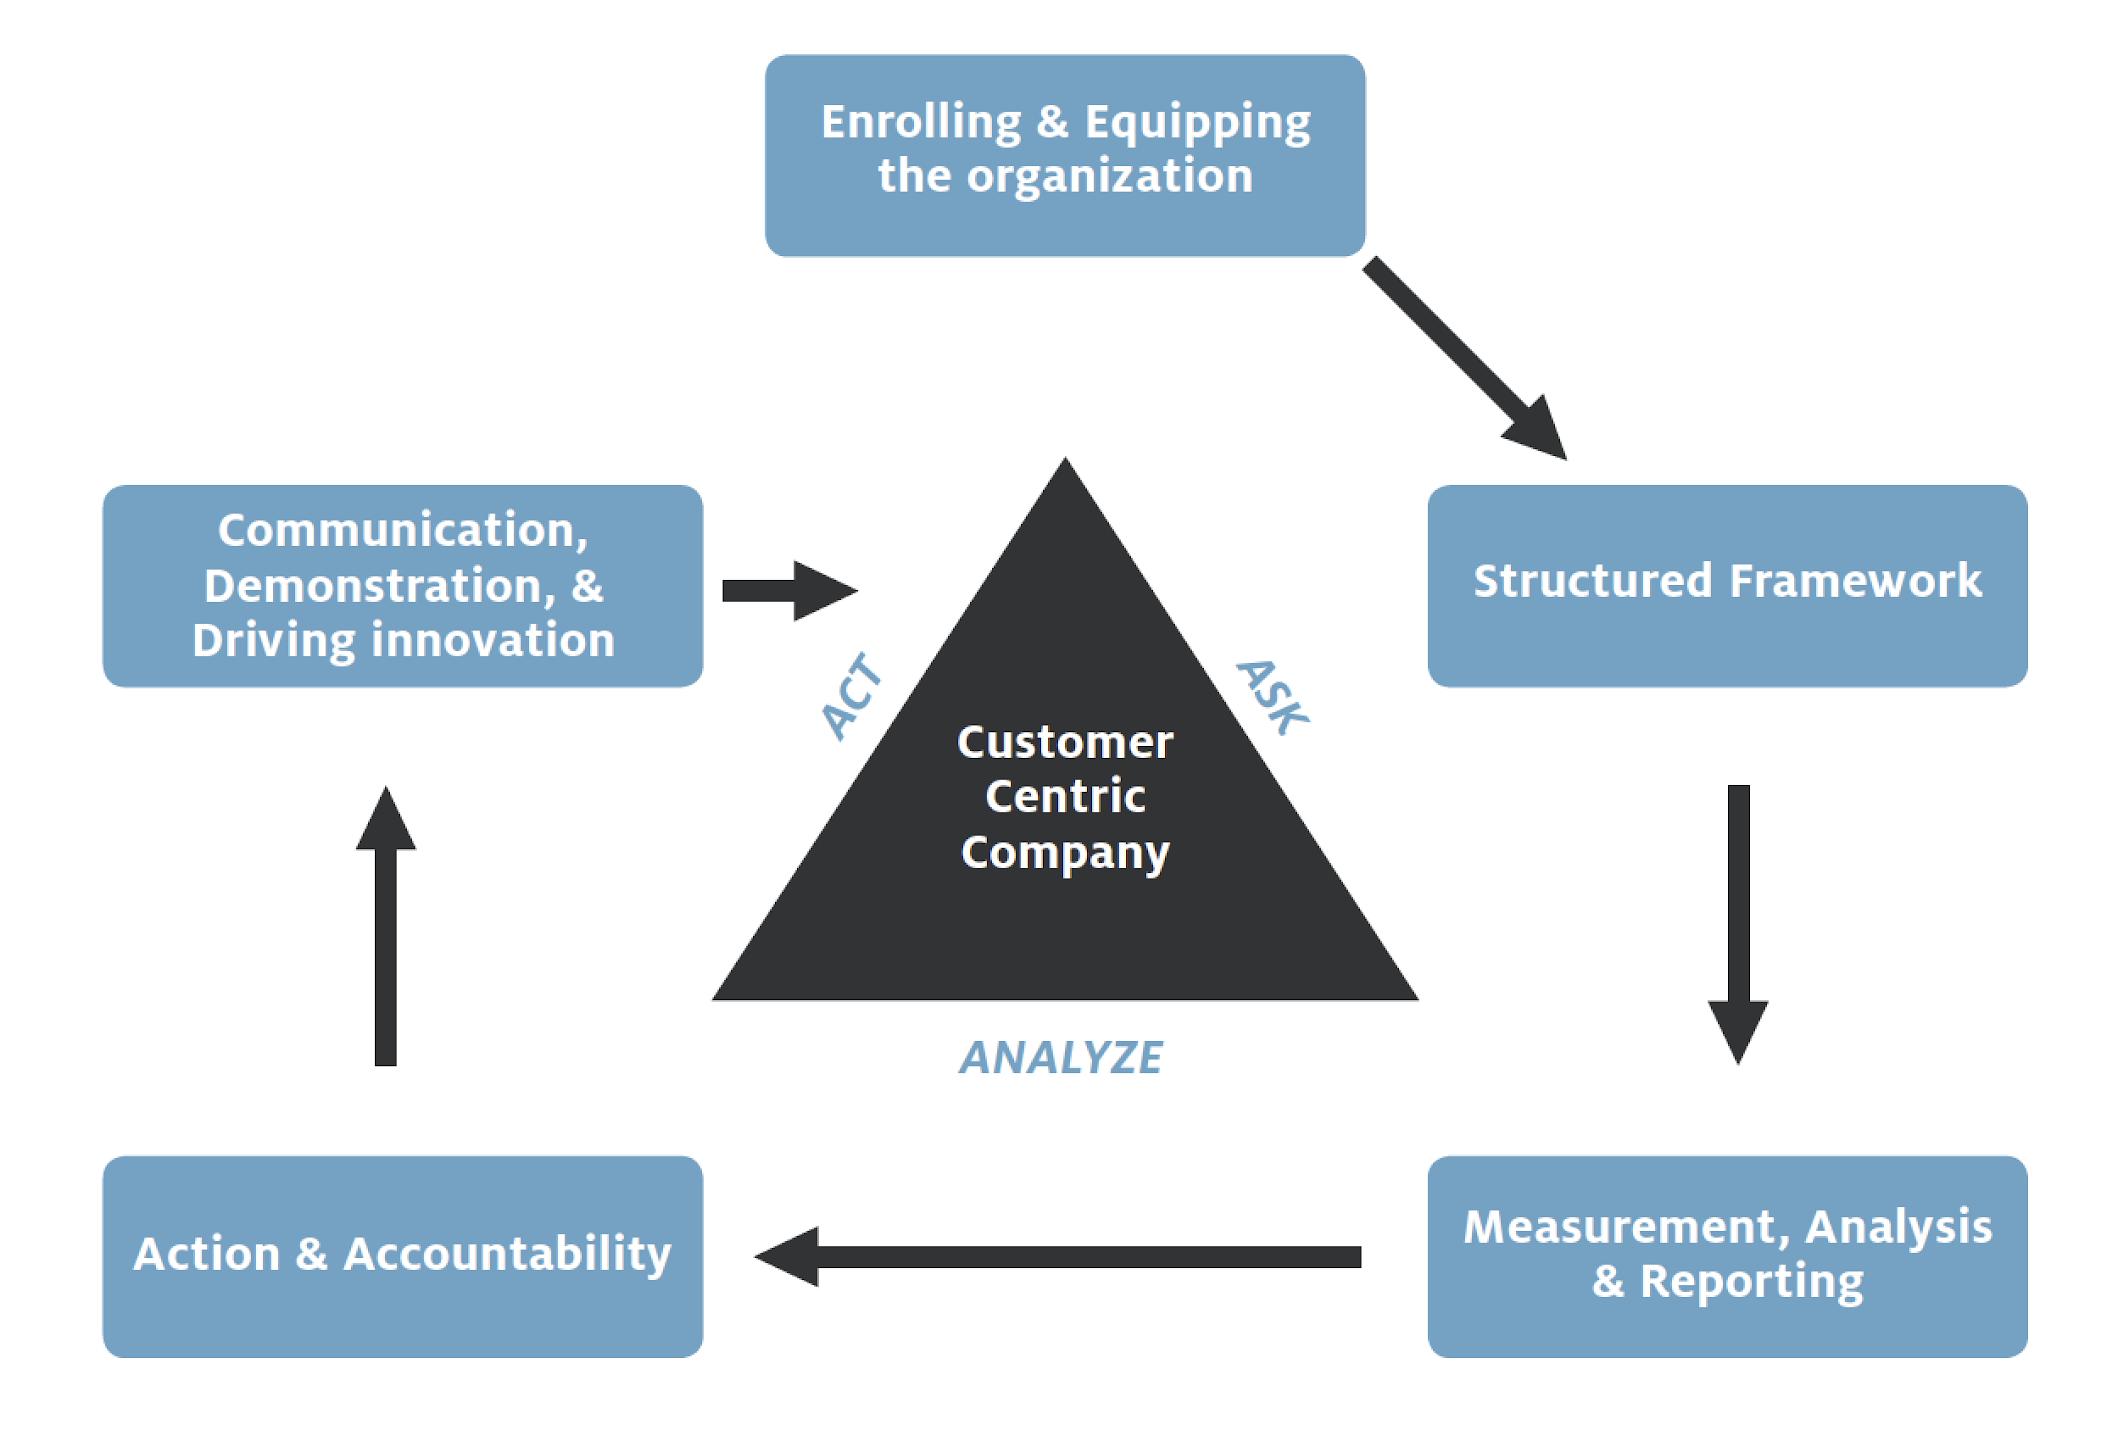 Customer Centric Company